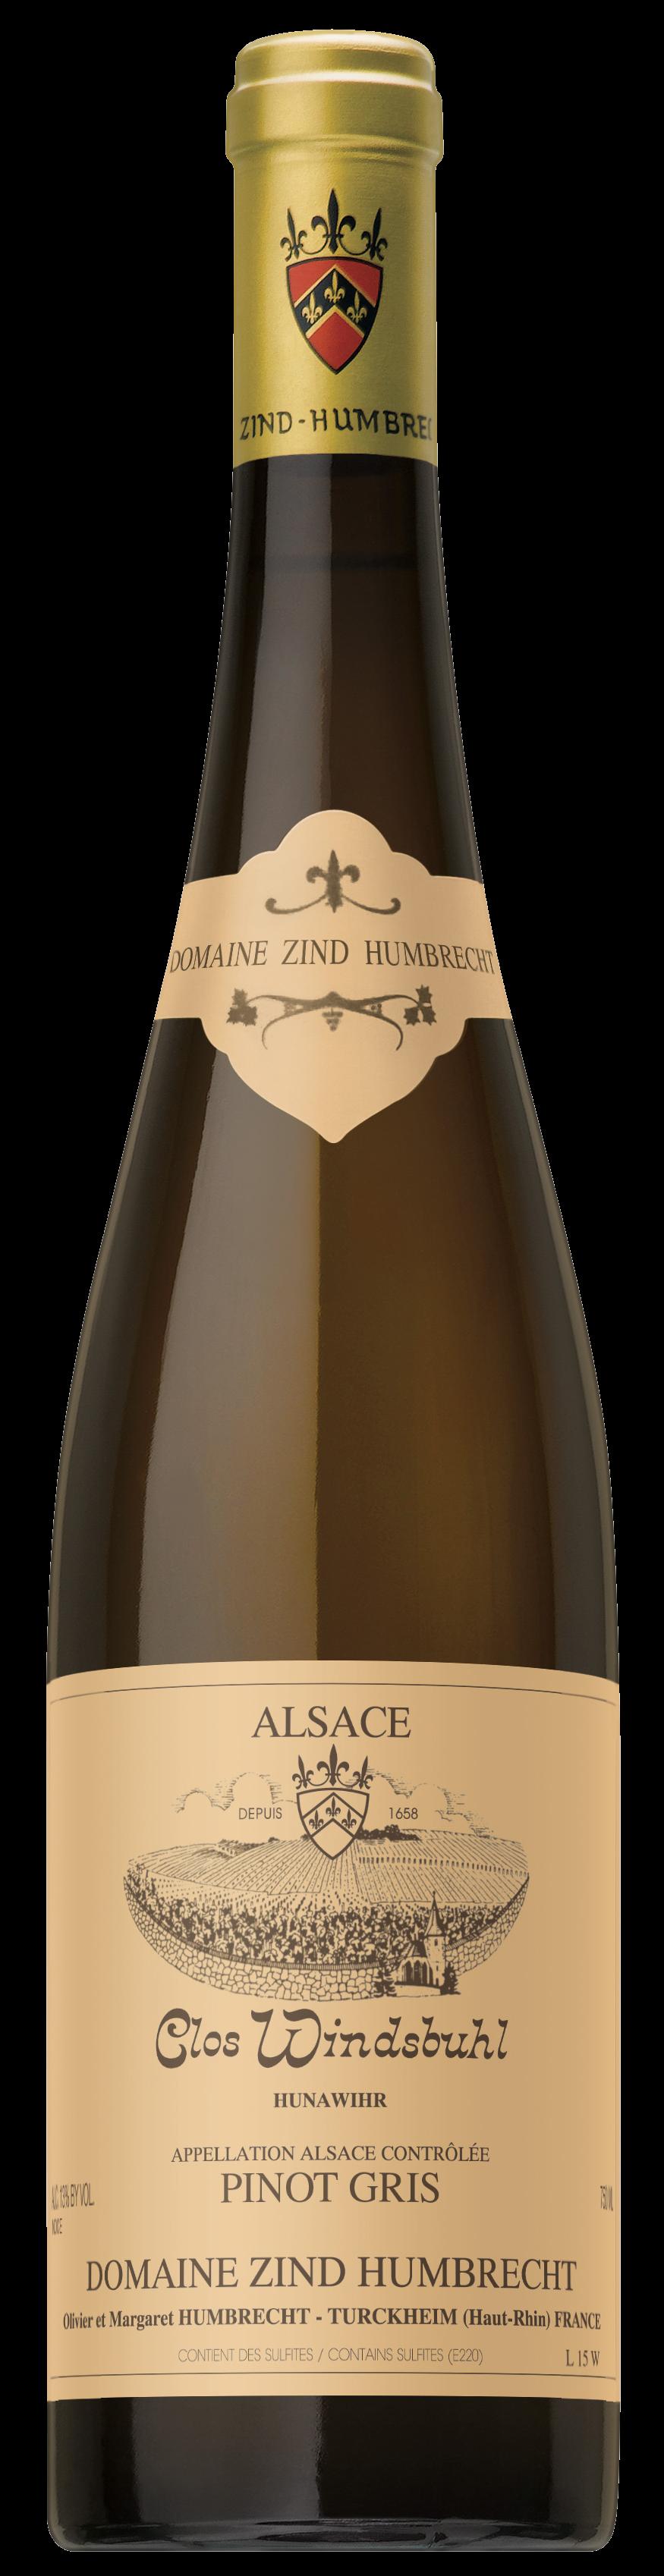 Pinot gris Clos Windsbuhl 2015